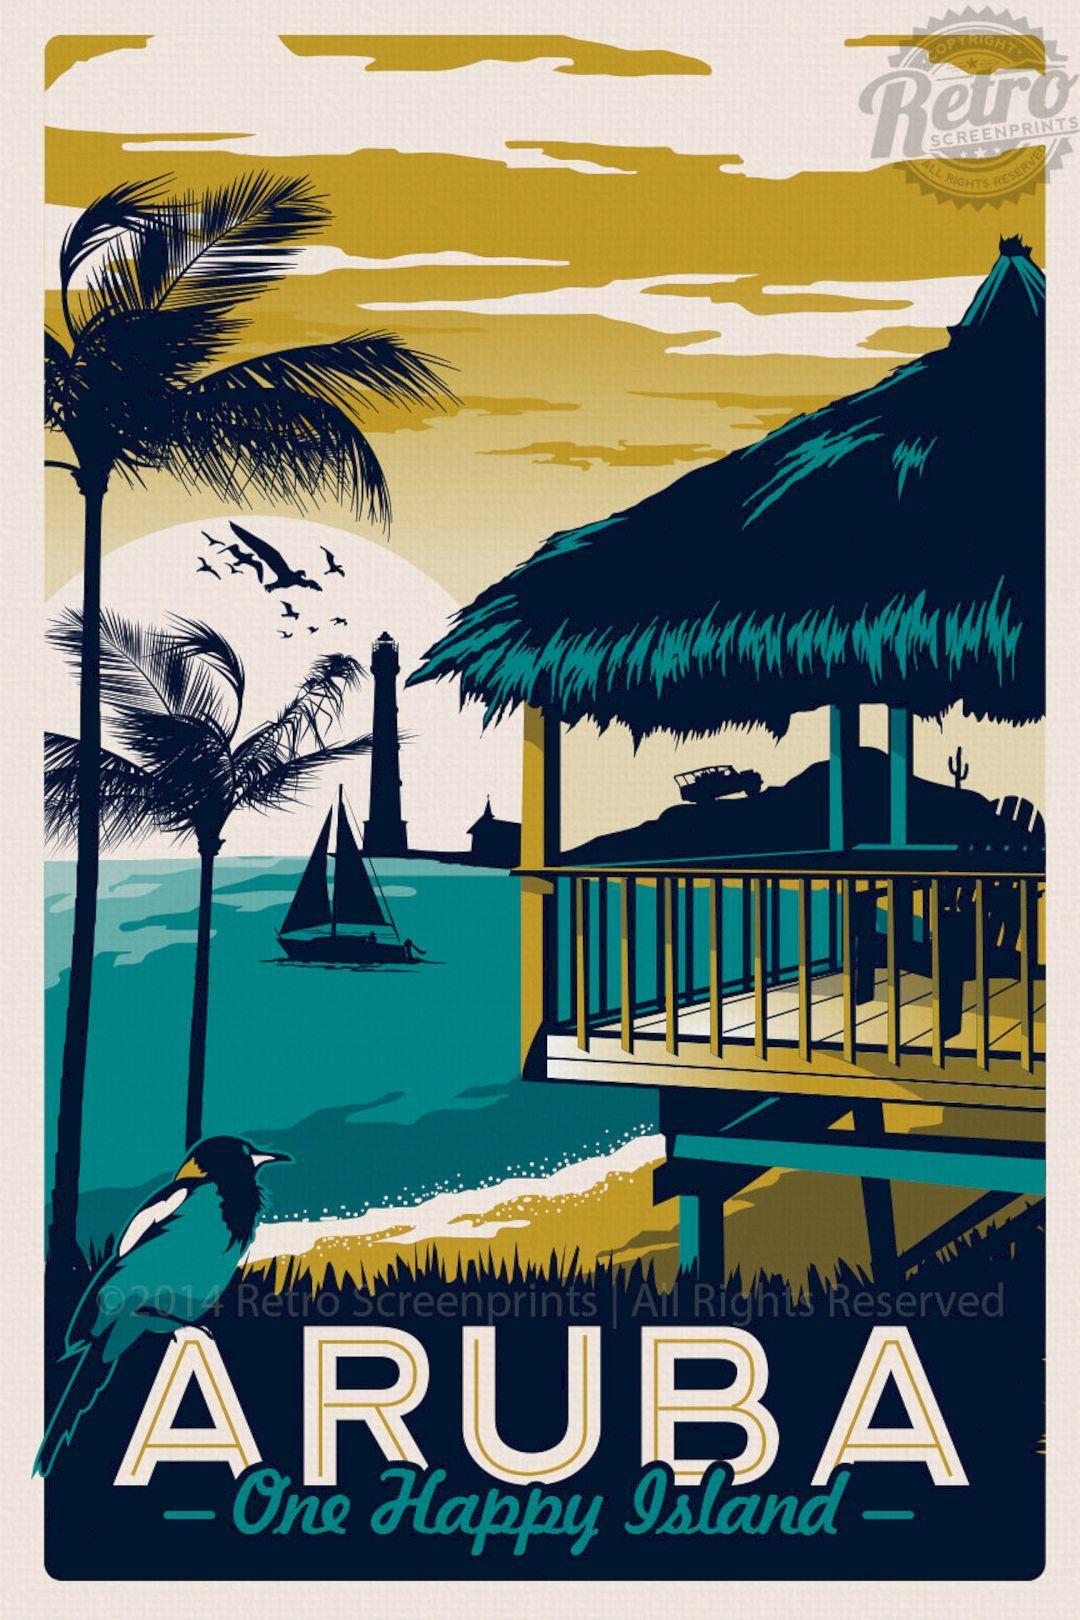 Poster design ideas - Awesome Retro Poster Design Ideas